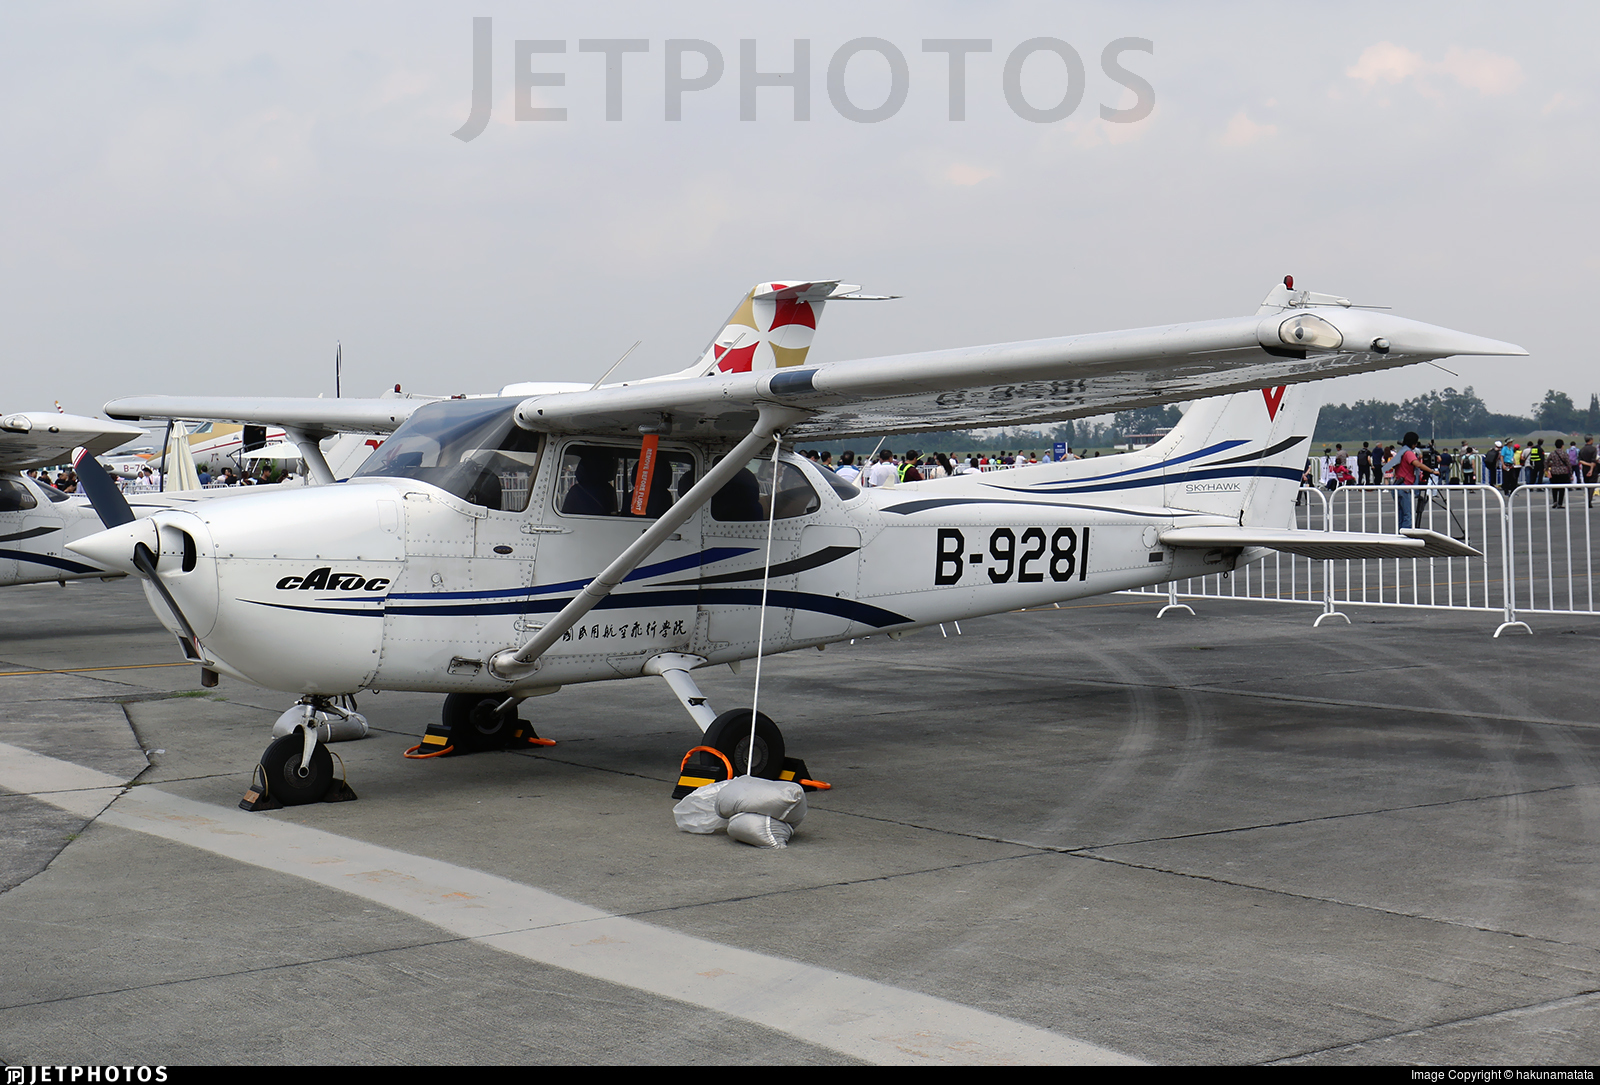 B-9281 - Cessna 172R Skyhawk - Civil Aviation Flight University of China